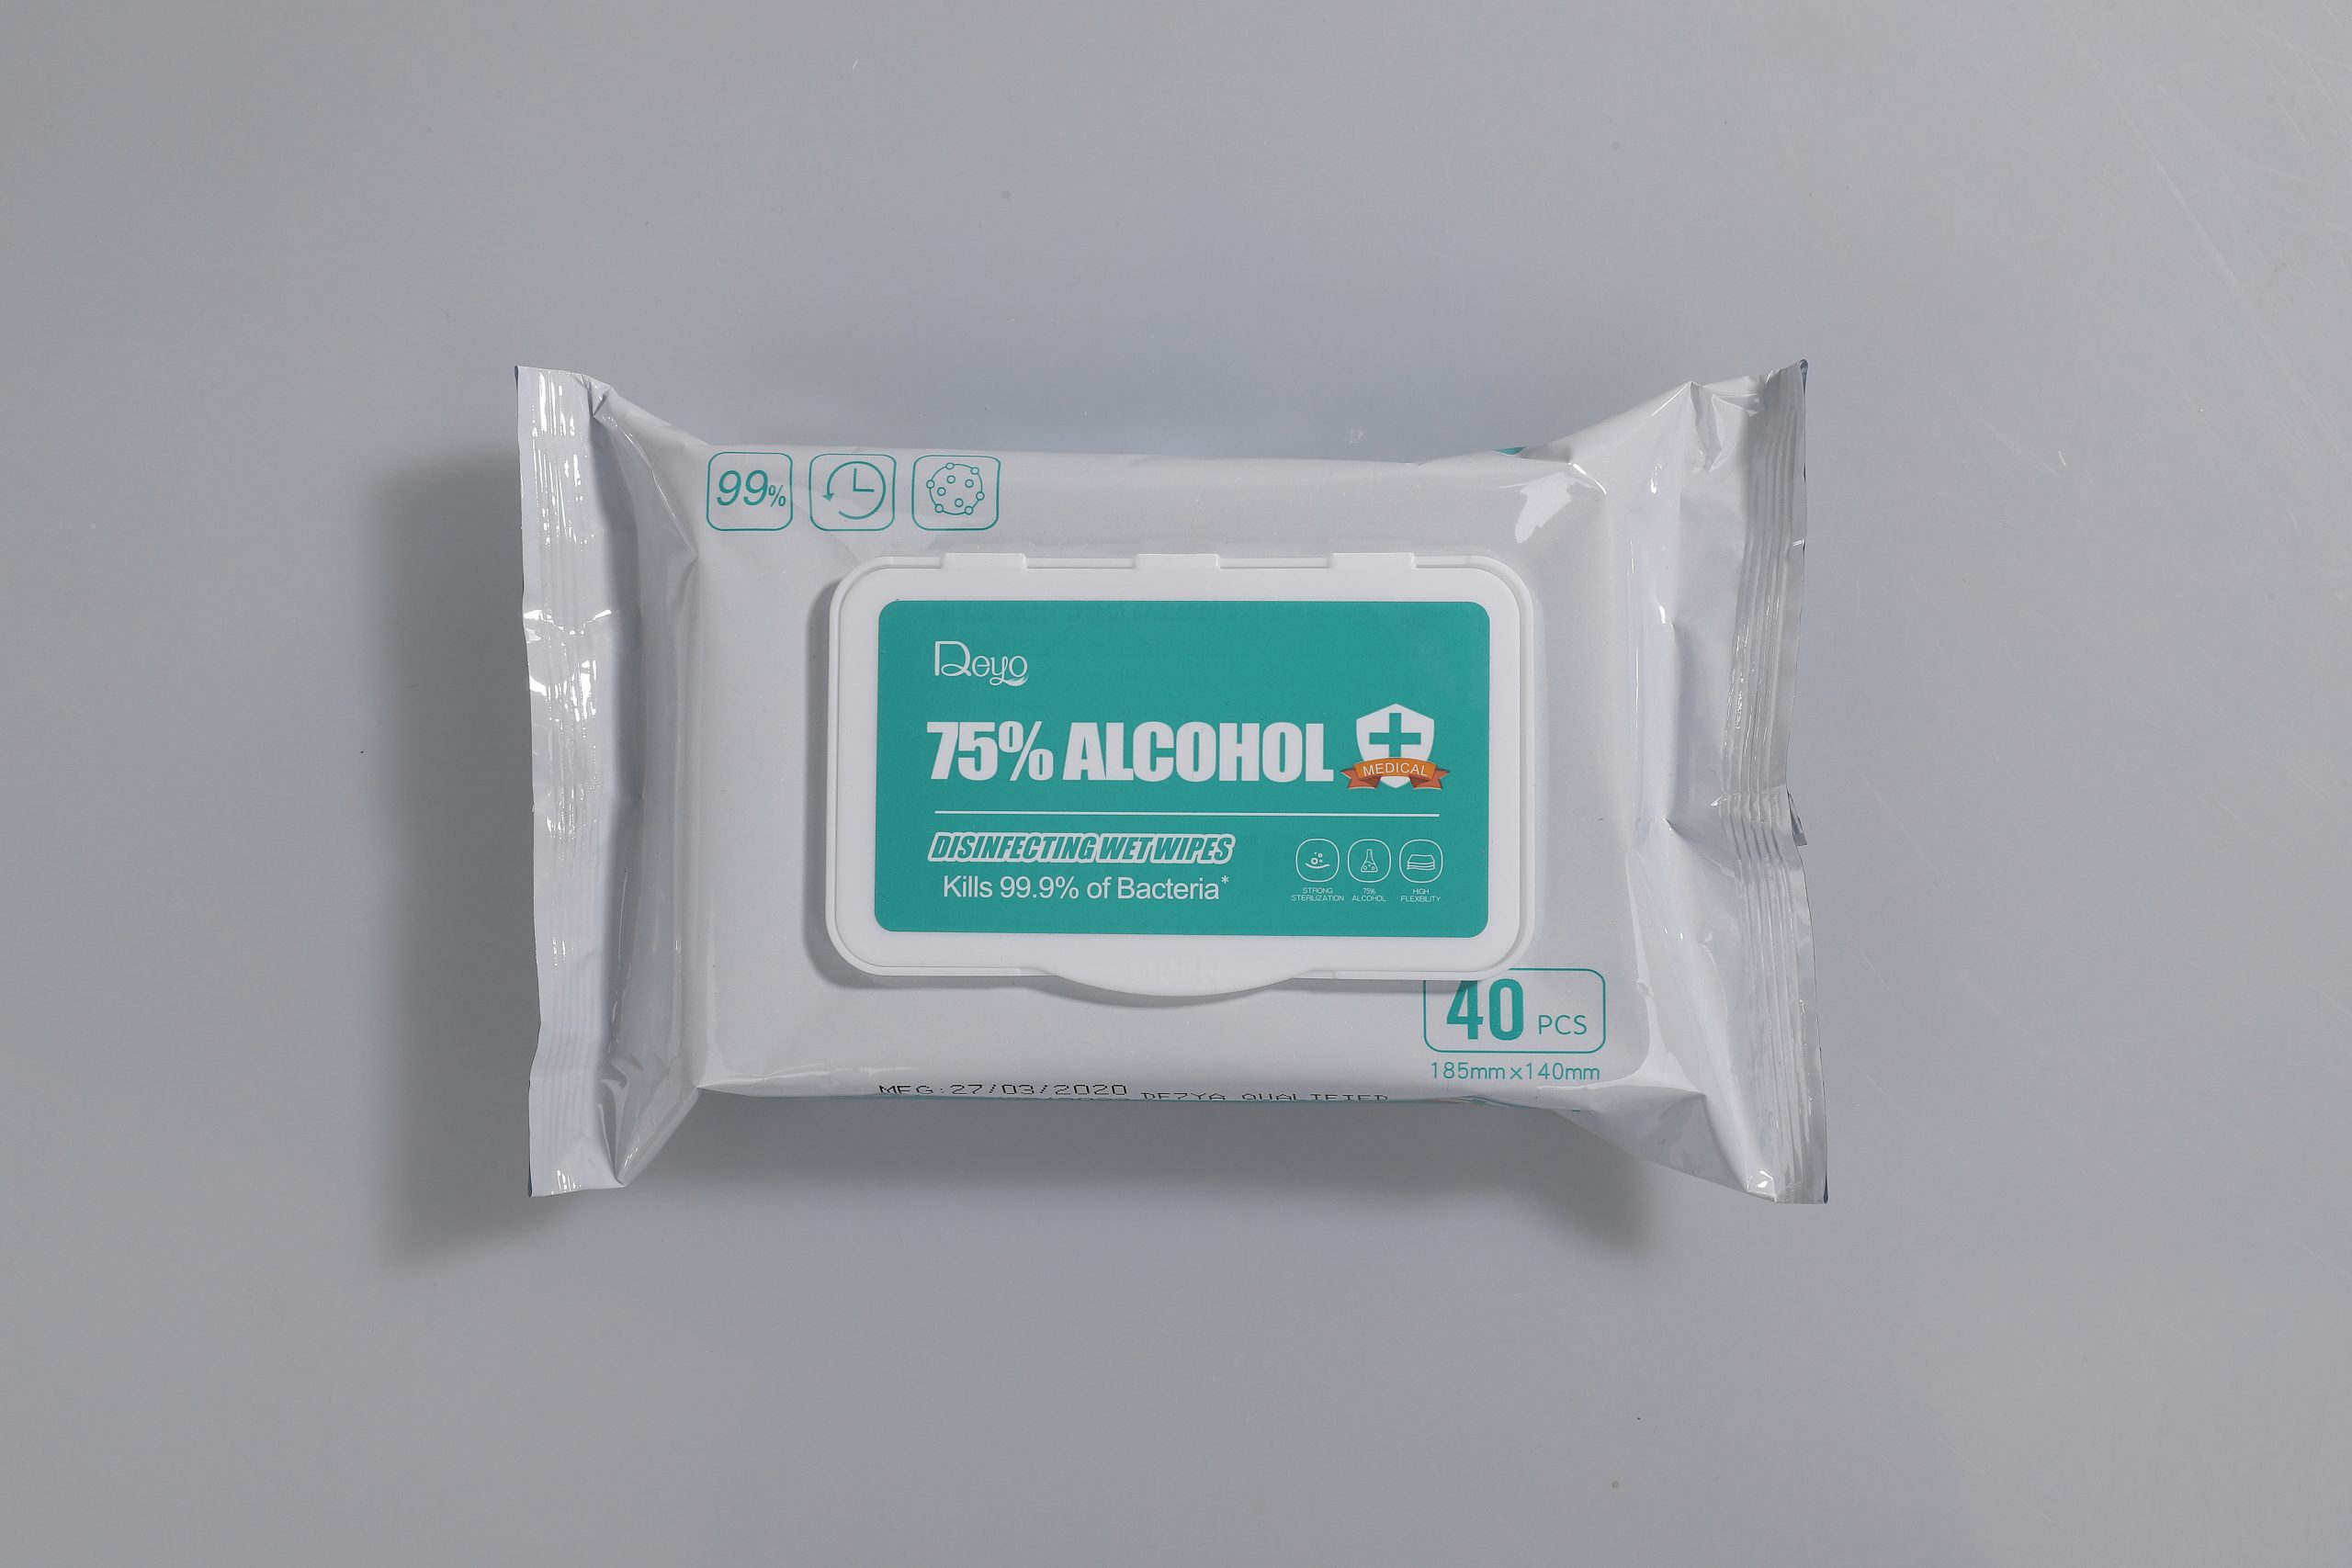 40pcs alcohol wipes